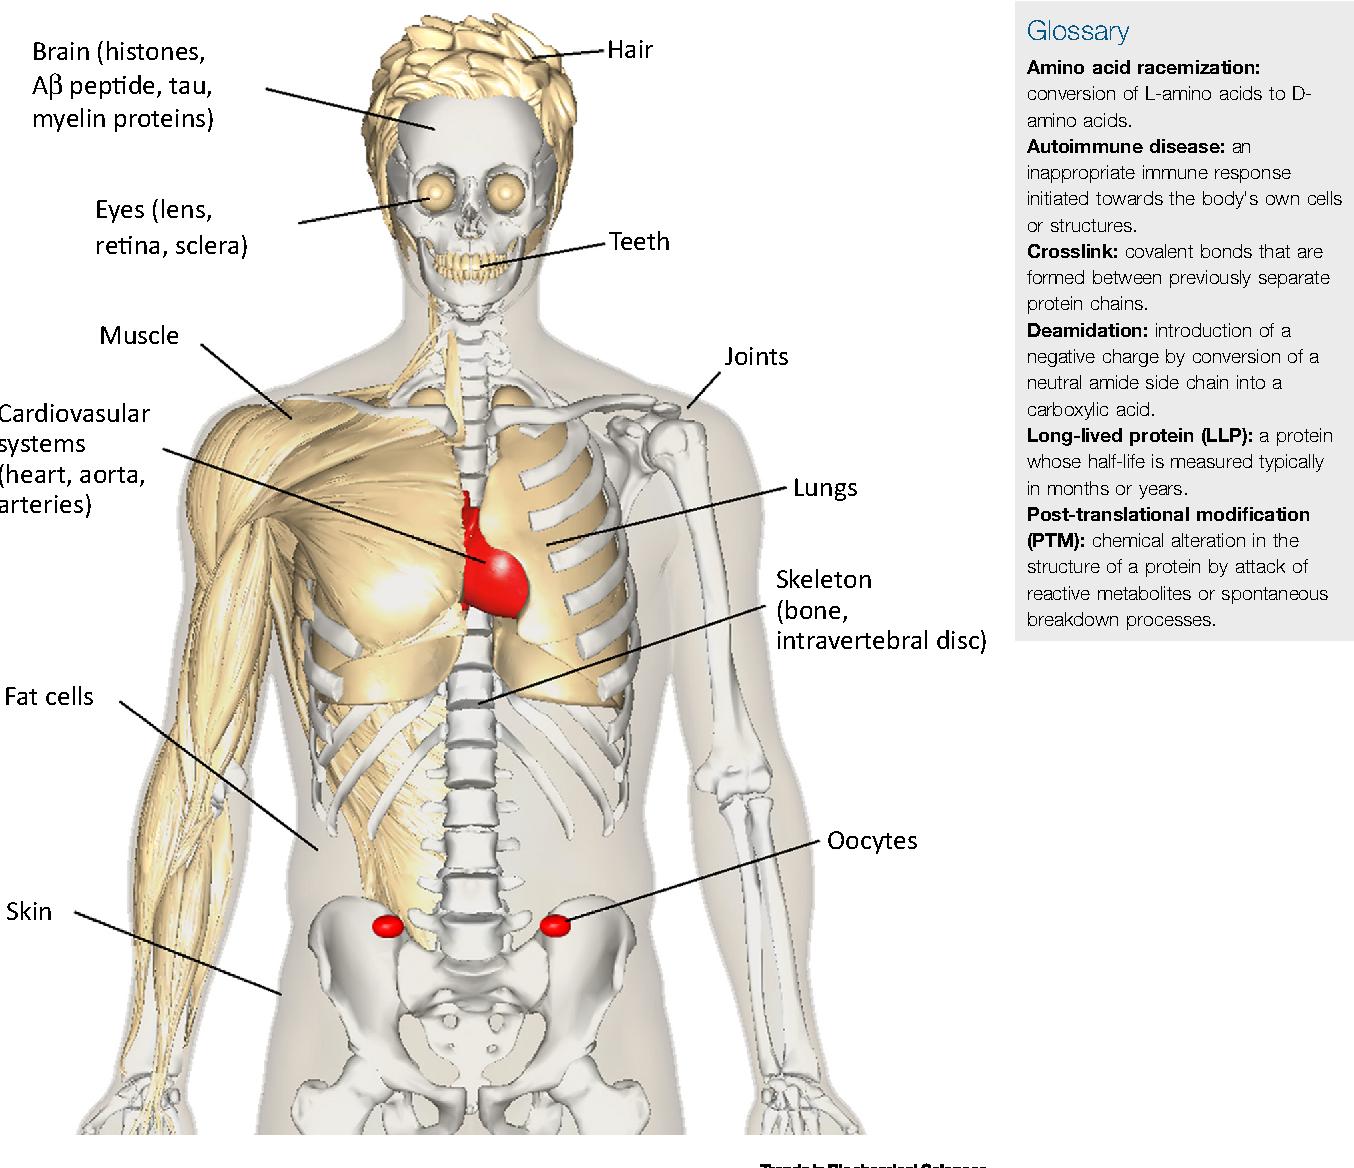 Resultado de imagem para organs ageeing